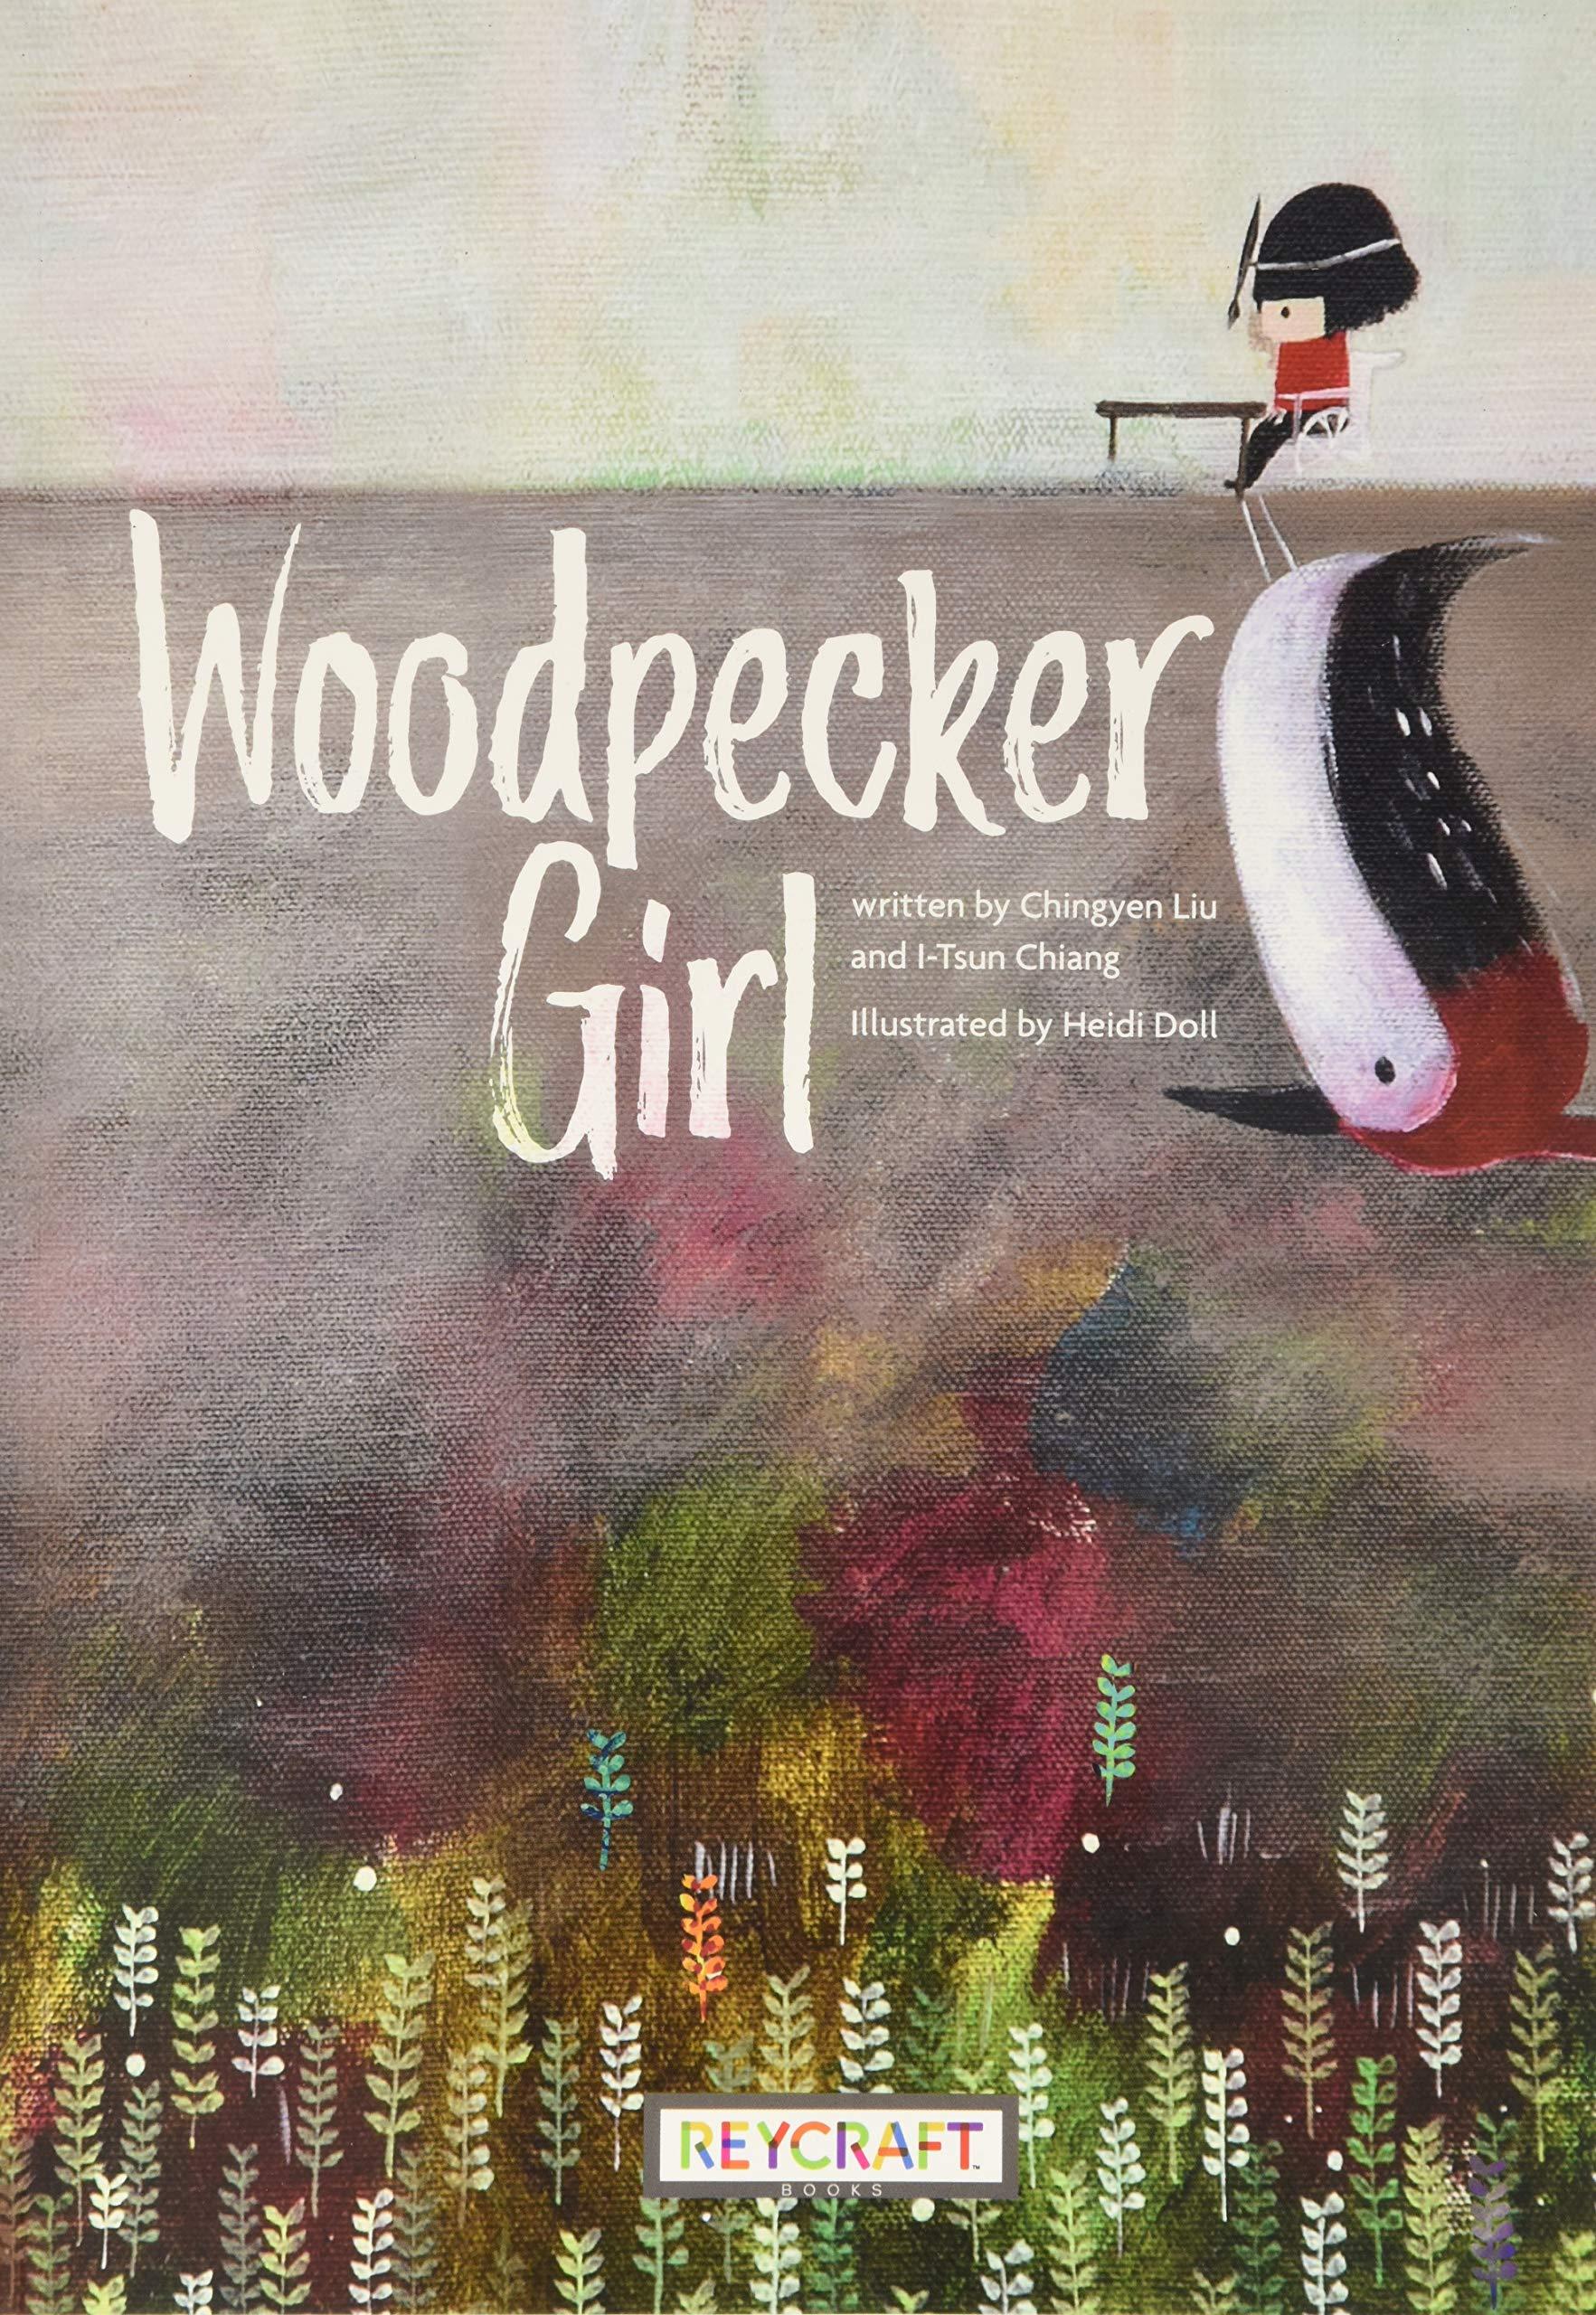 Woodpecker Girl: Chiang, I-Tsun, Liu, Chingyen: 9781478869559: Amazon.com:  Books